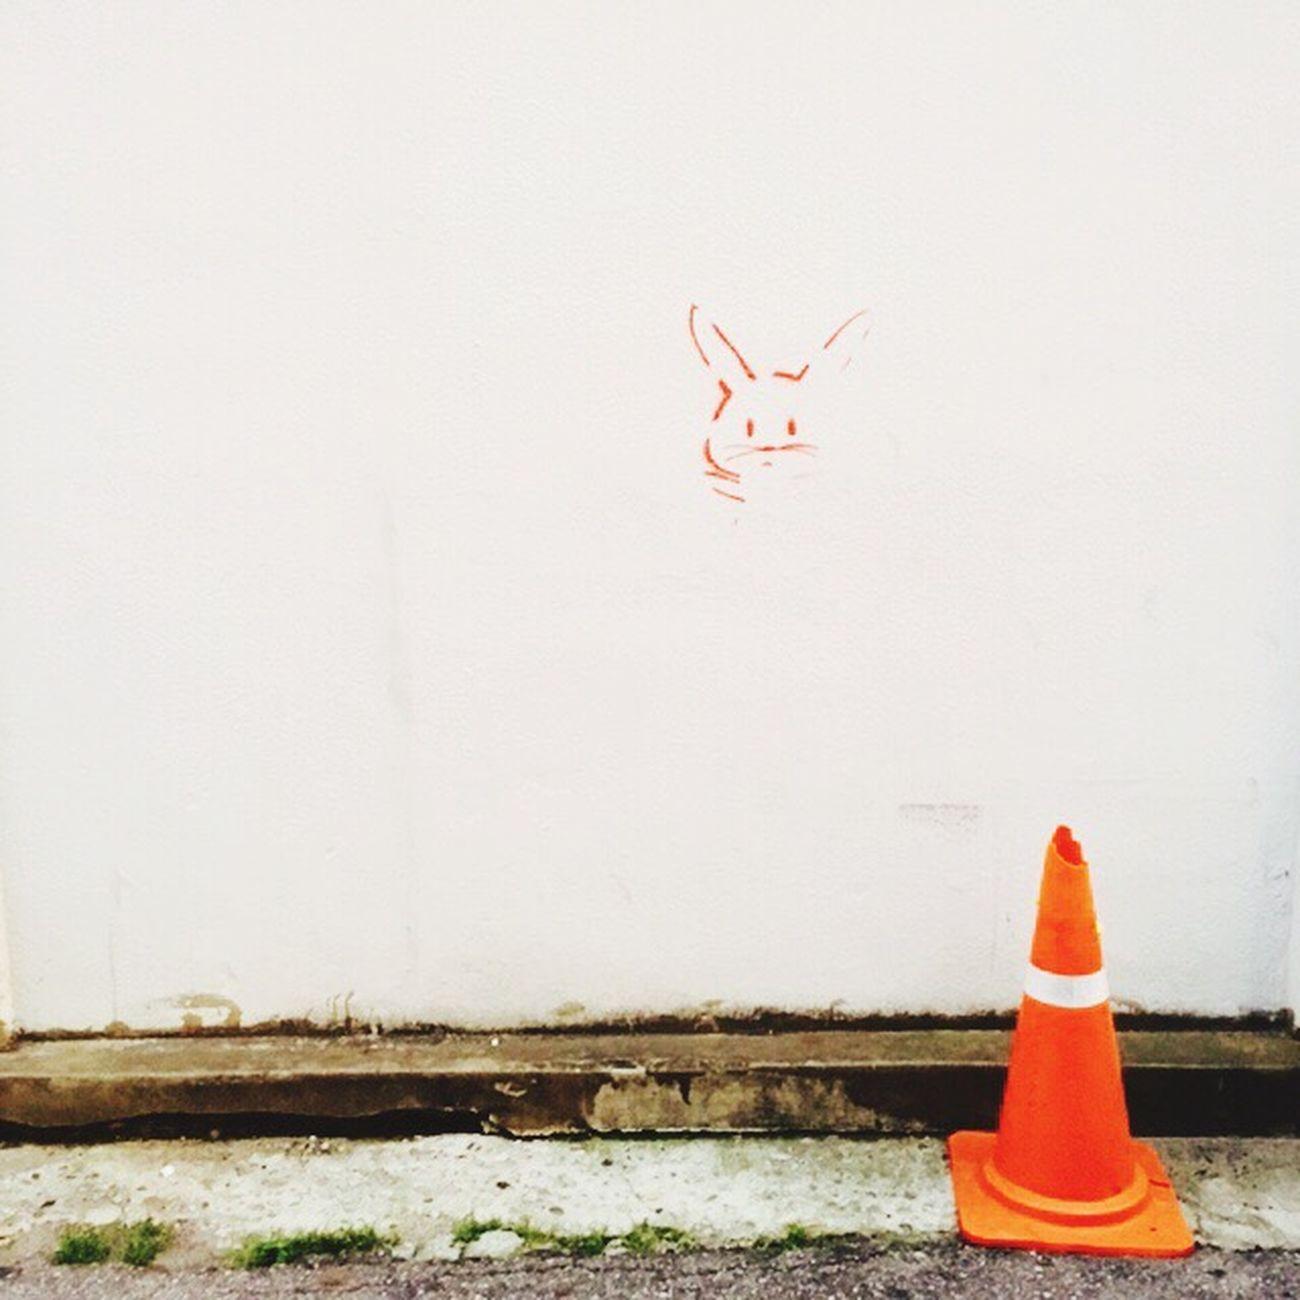 Seoul Street Wall Wall Art Pikachu Living In Asia